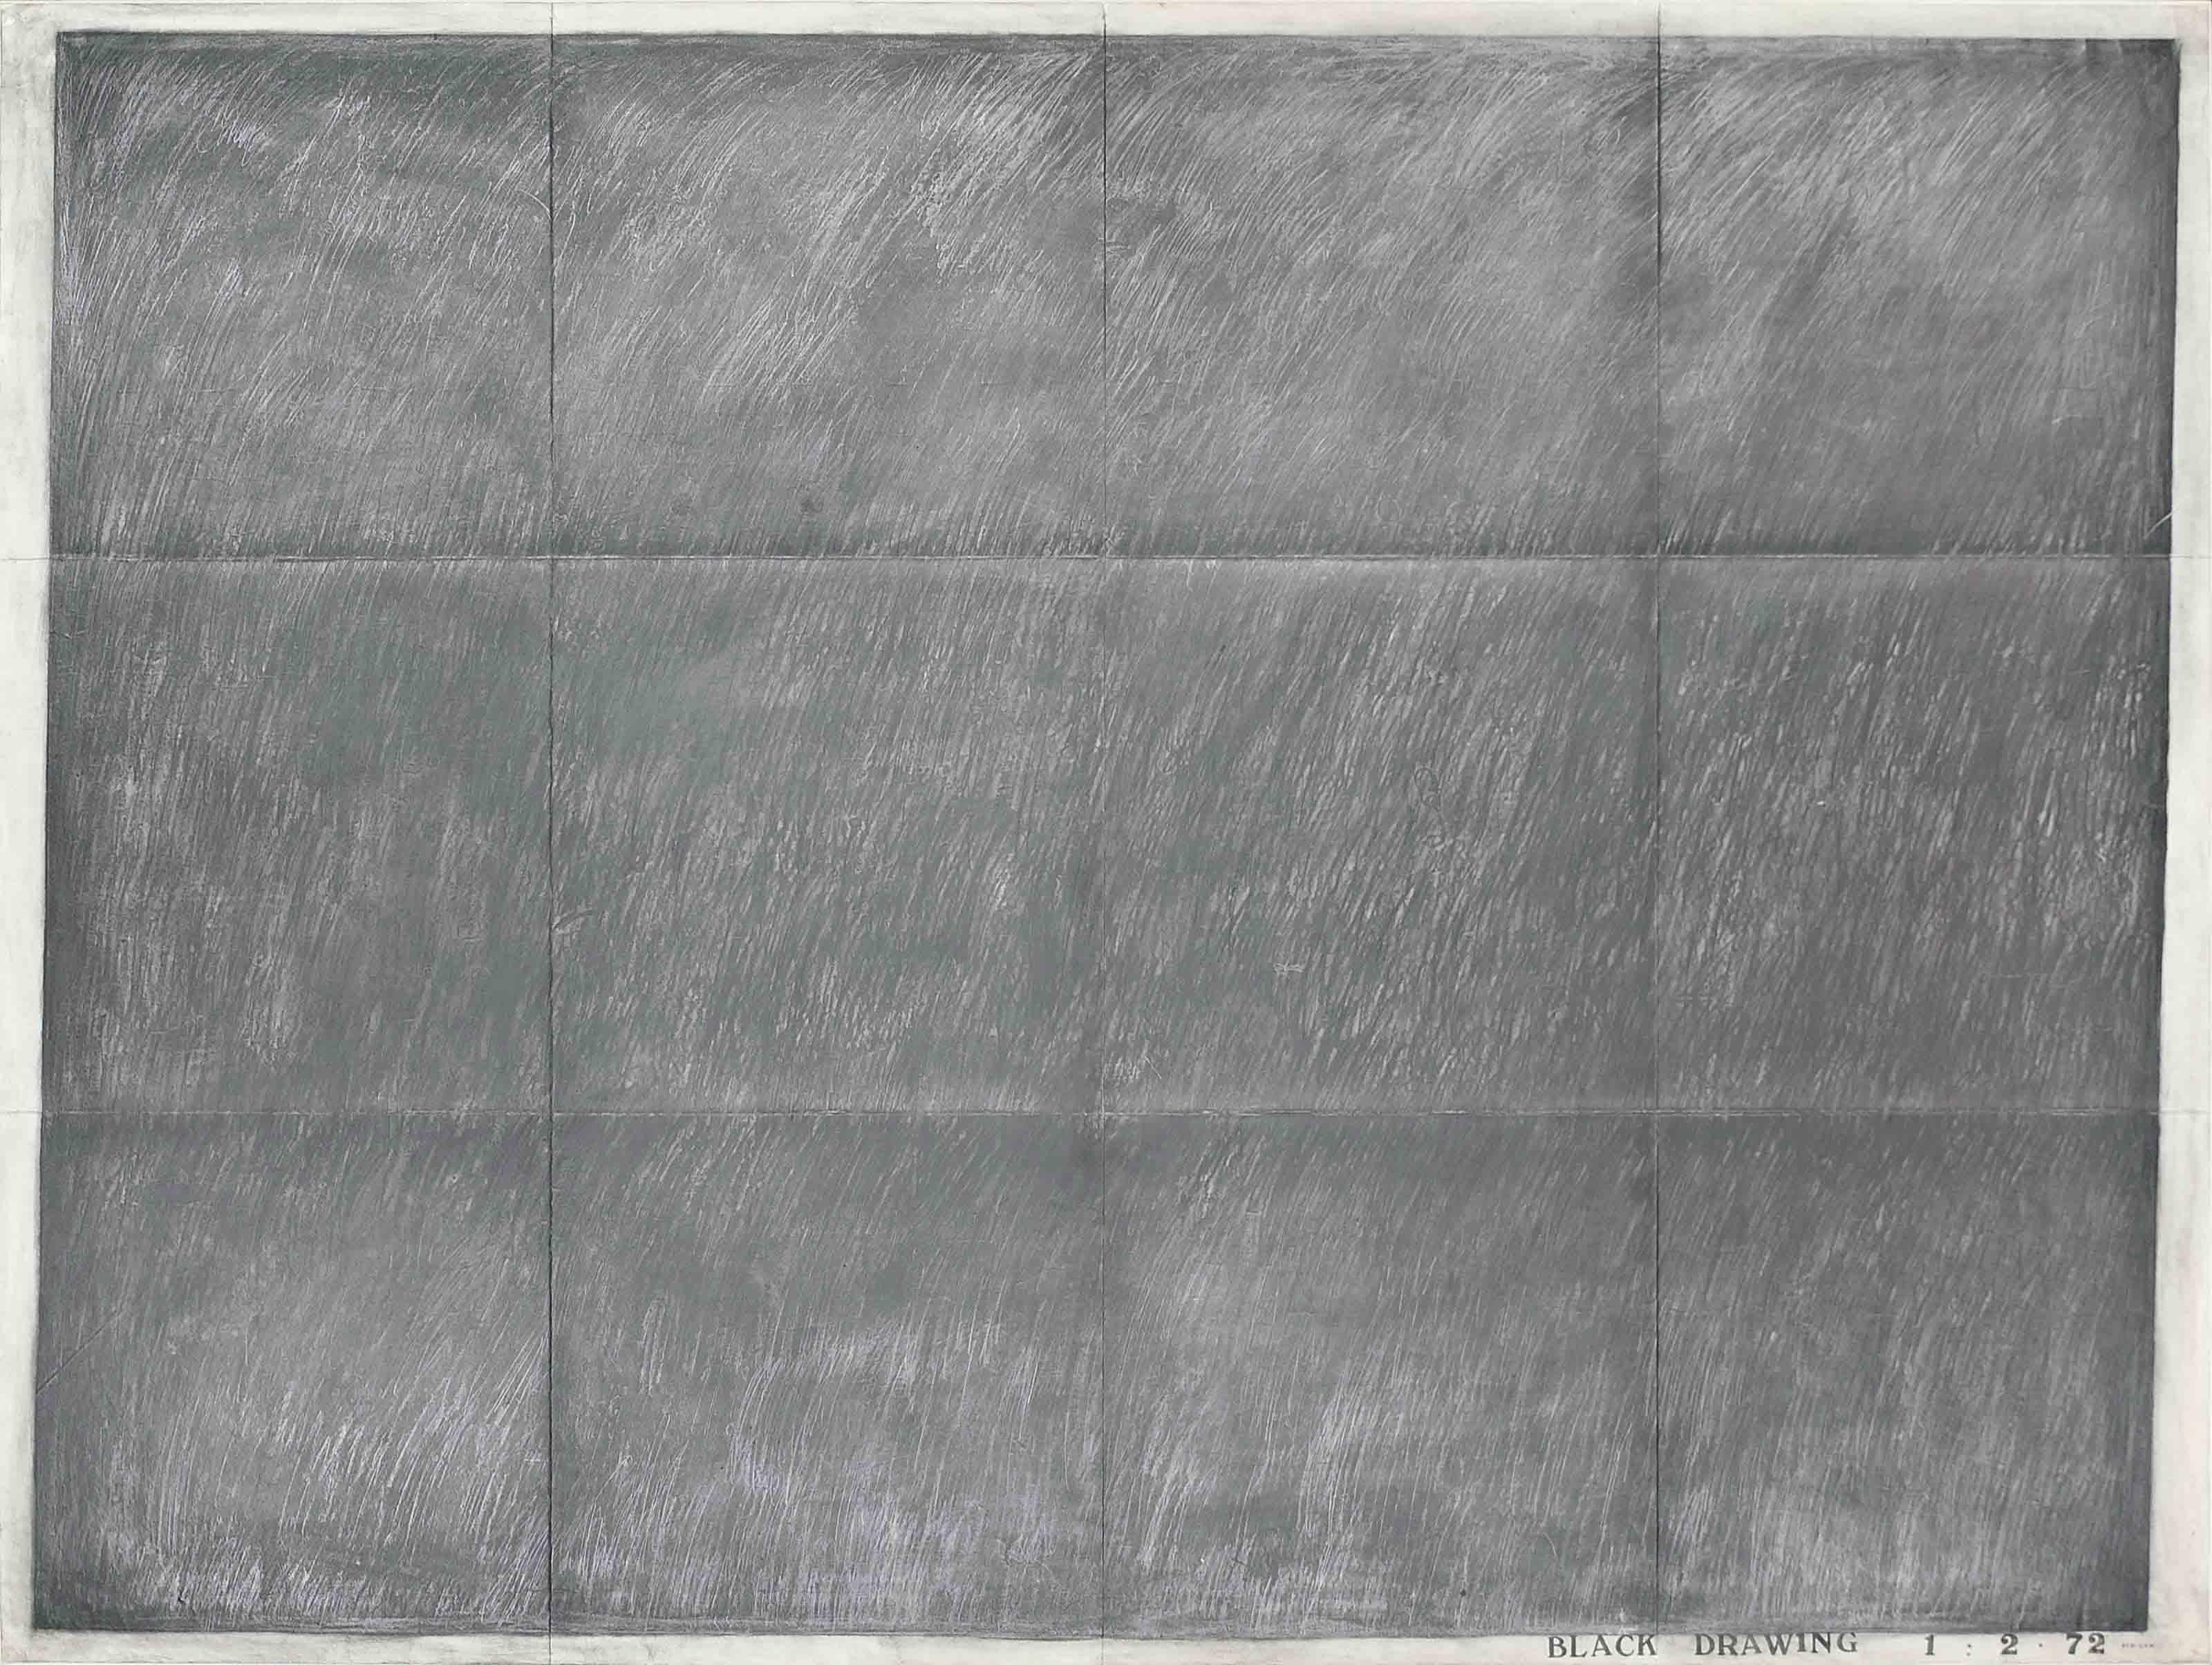 Black Drawing 1.2.72